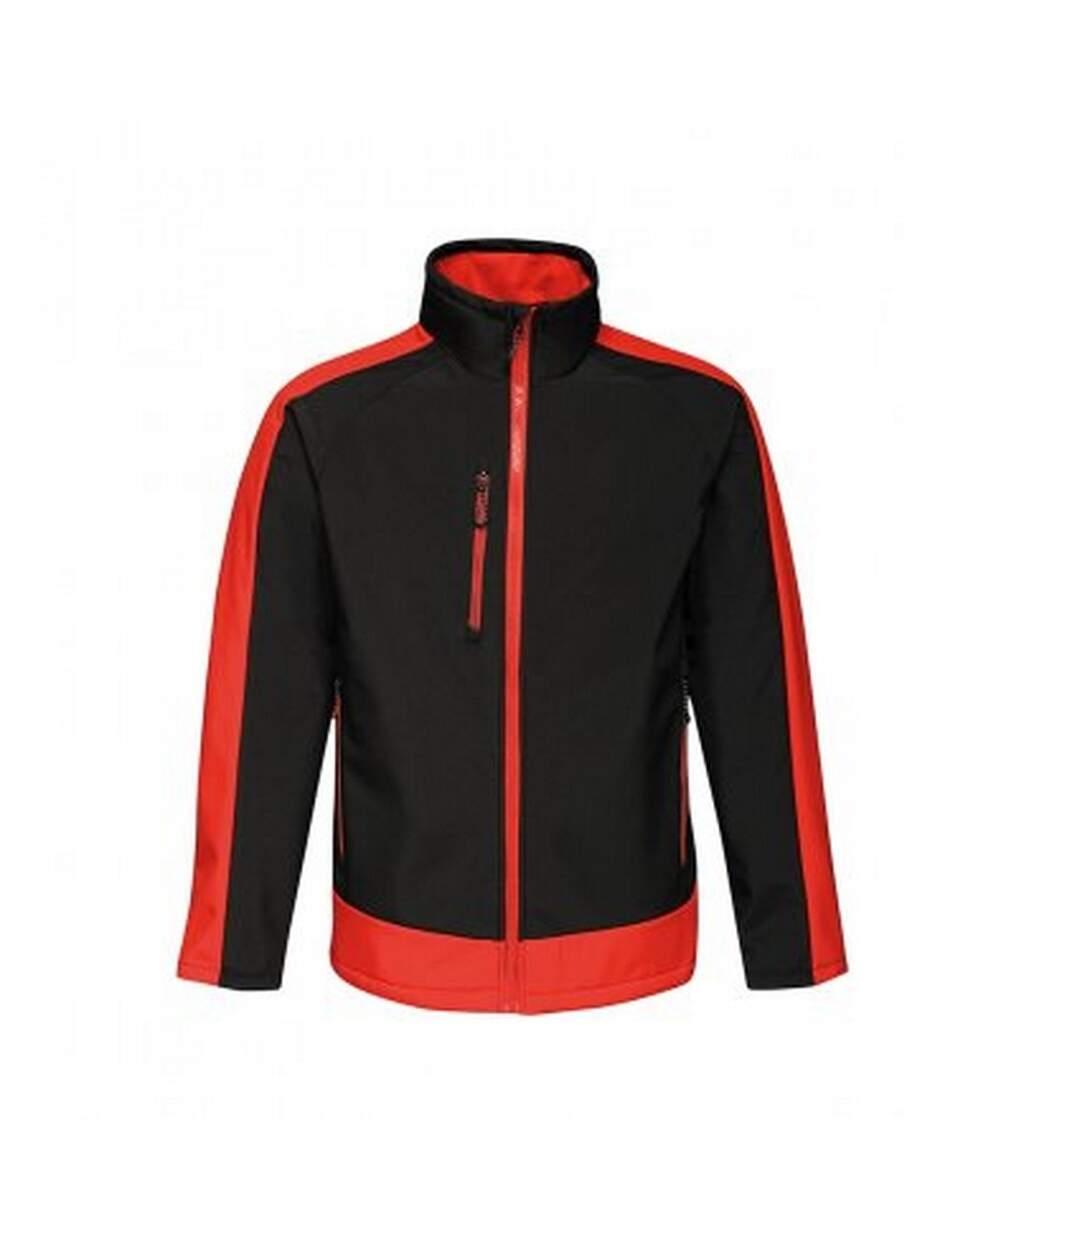 Regatta  Mens Contrast Three Layer Printable Soft Shell Jacket (Black/Classic Red) - UTPC3318